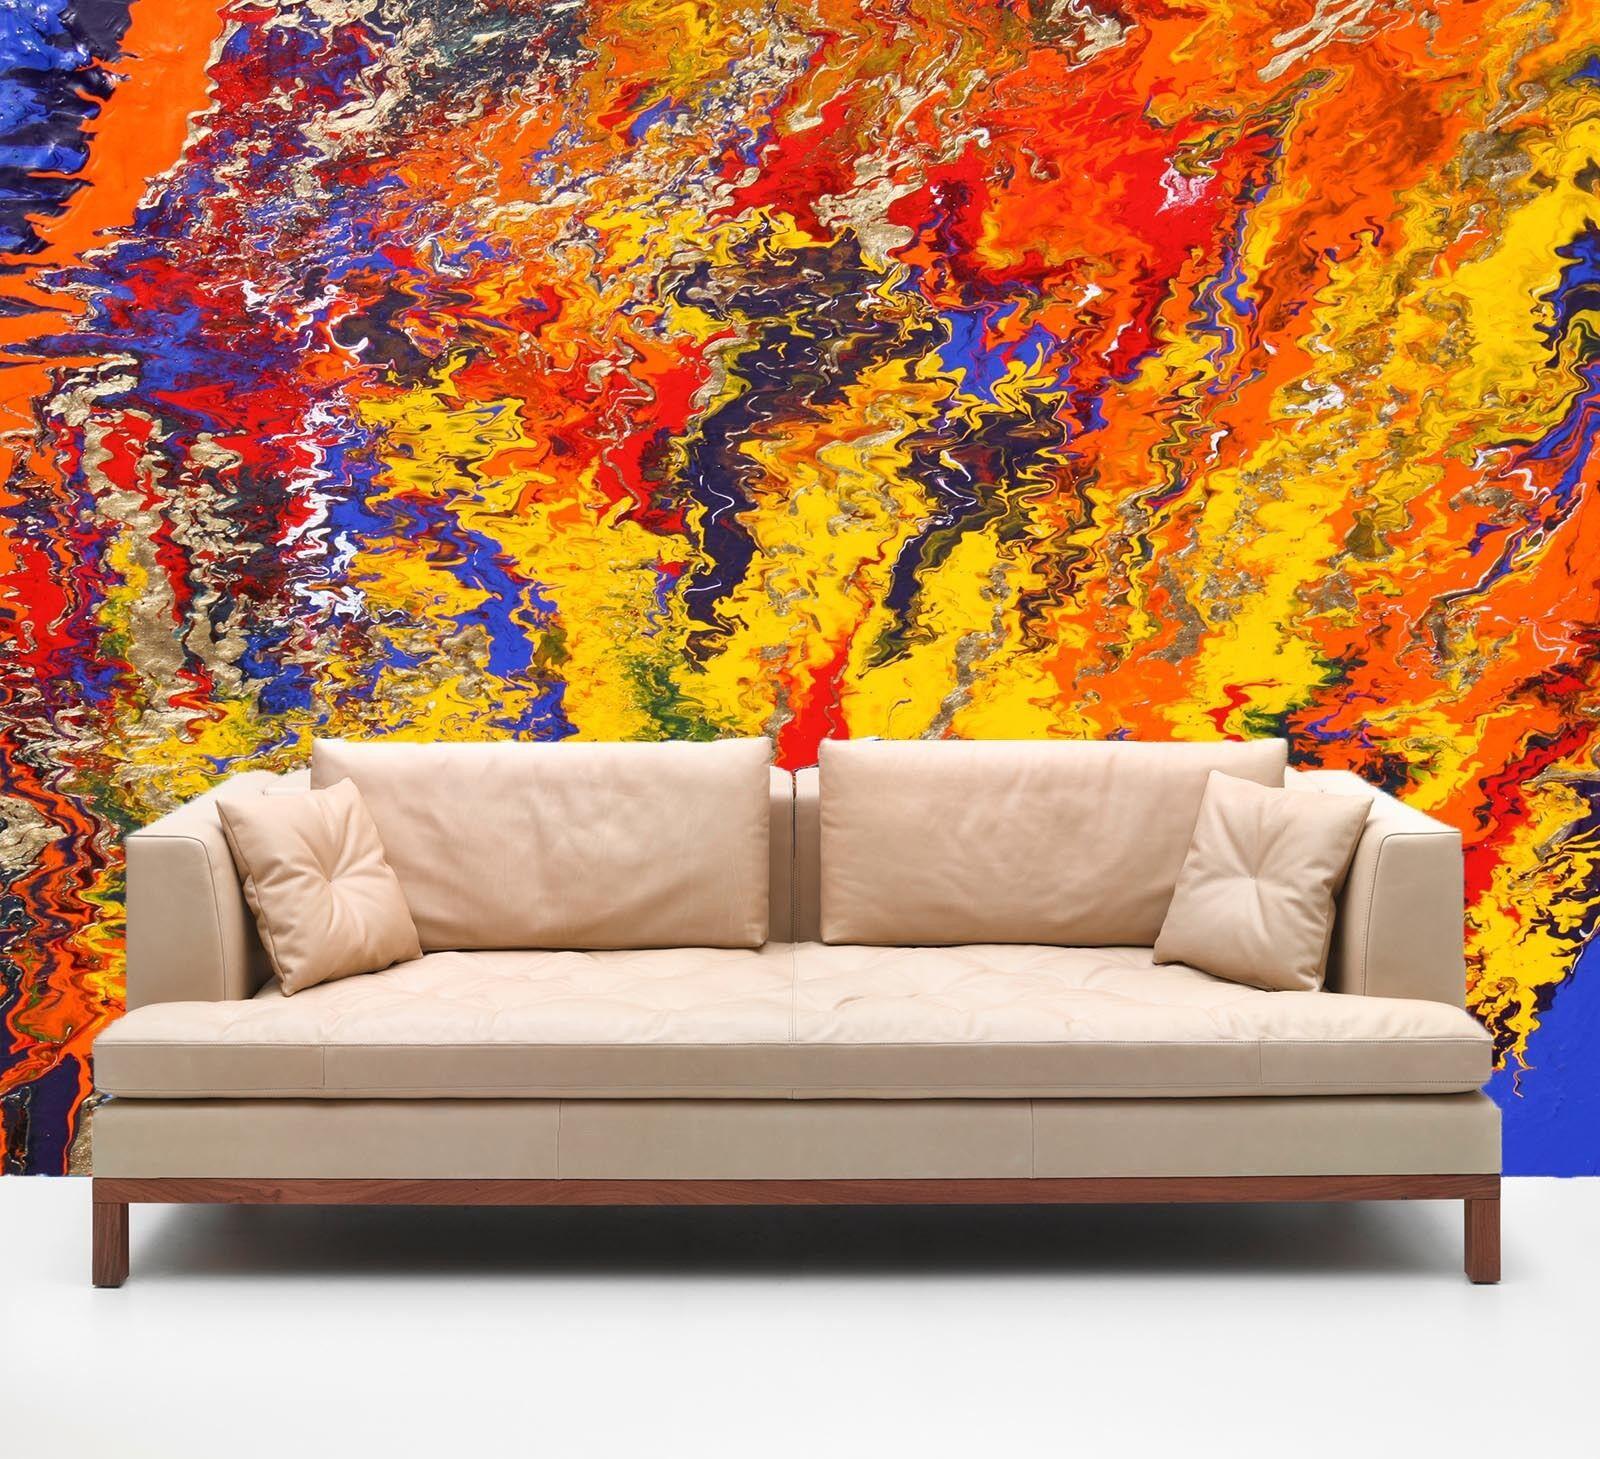 3D Mush Up Painting 48 Wall Paper Wall Print Decal Wall AJ WALLPAPER CA